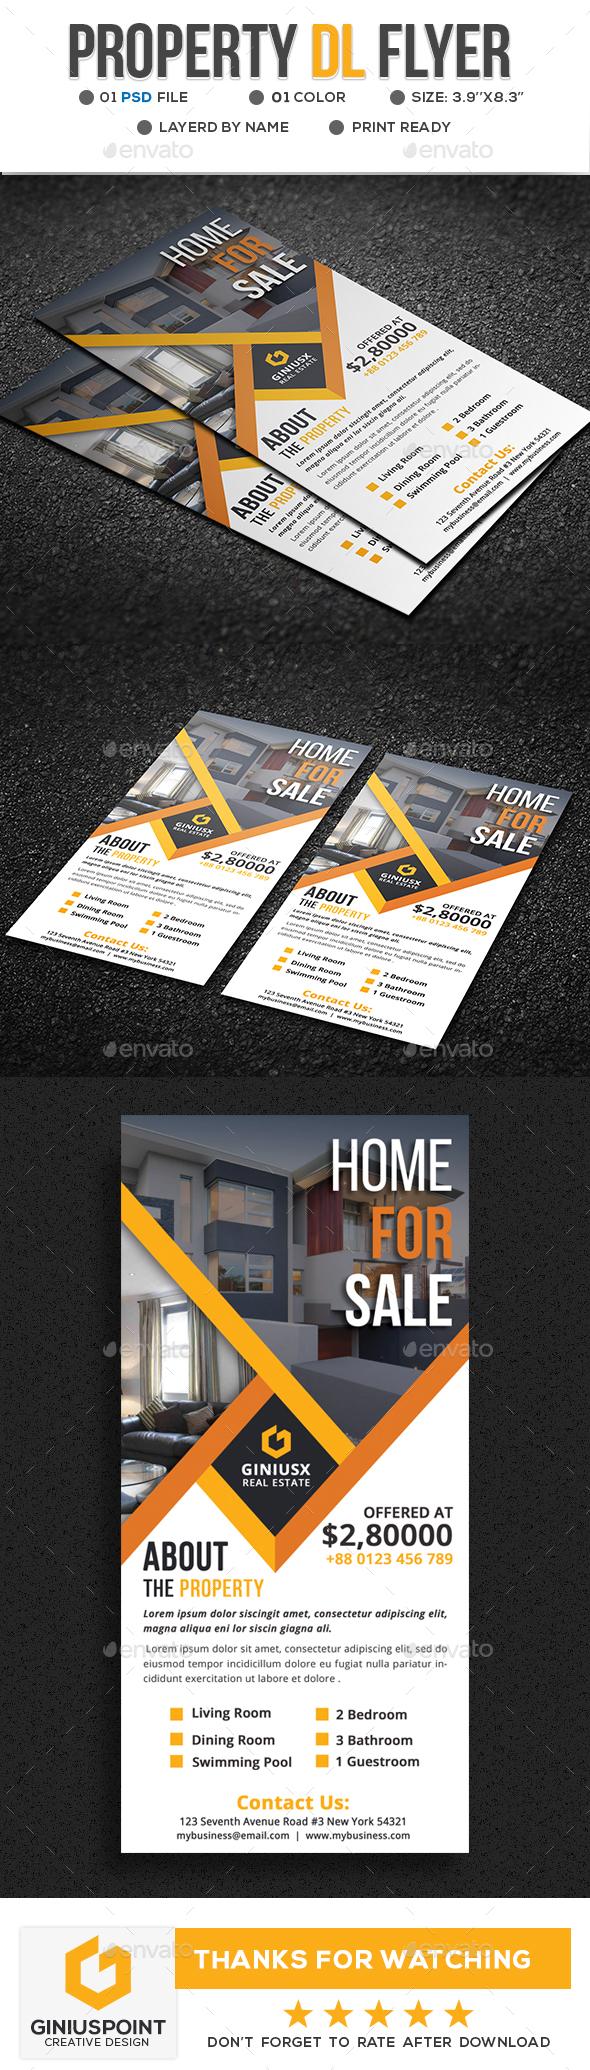 GraphicRiver Property DL-Flyer 20741500